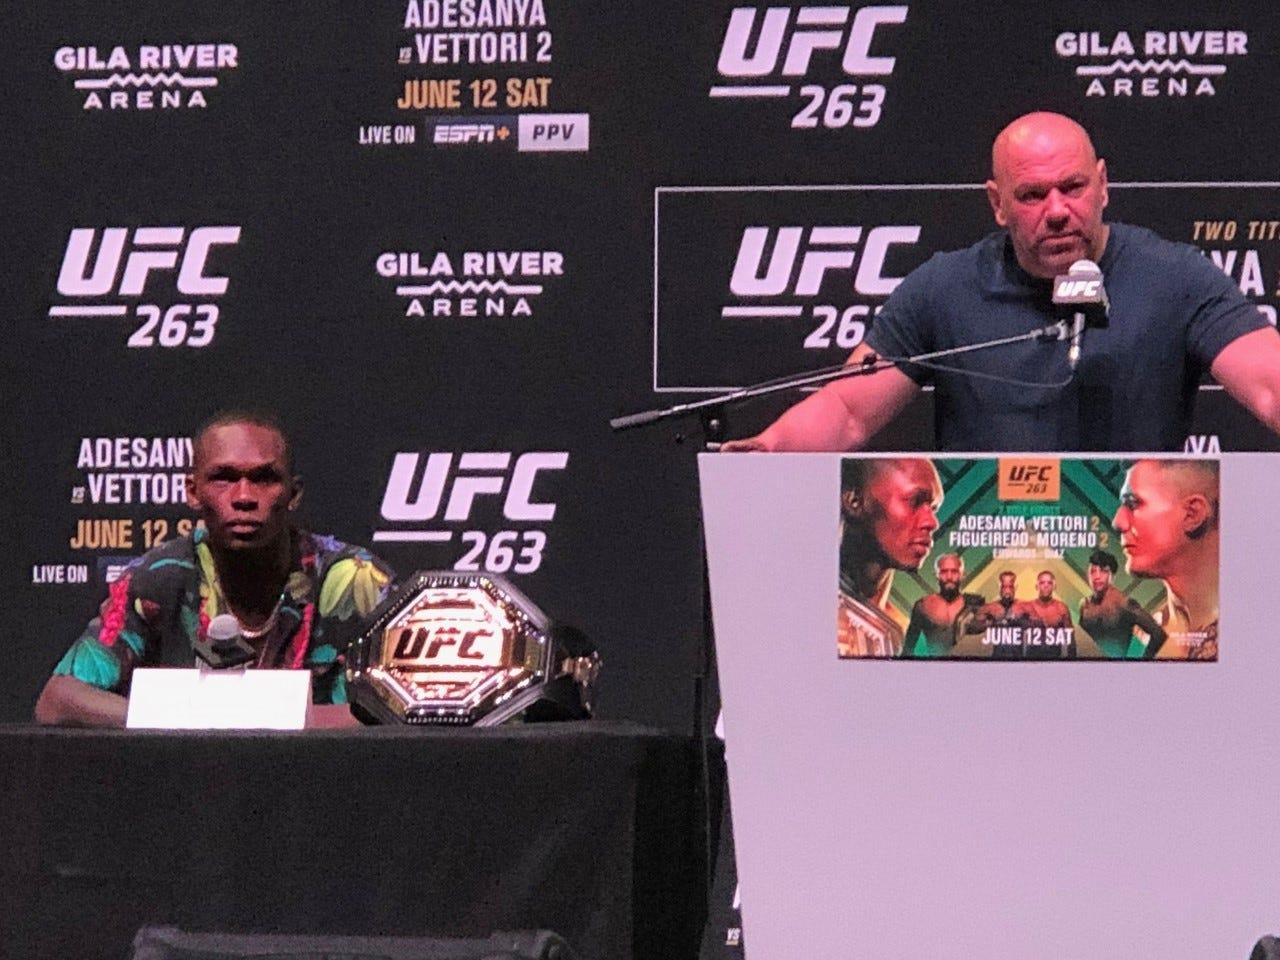 UFC President Dana White, on choosing Phoenix for UFC 263 Saturday in Glendale